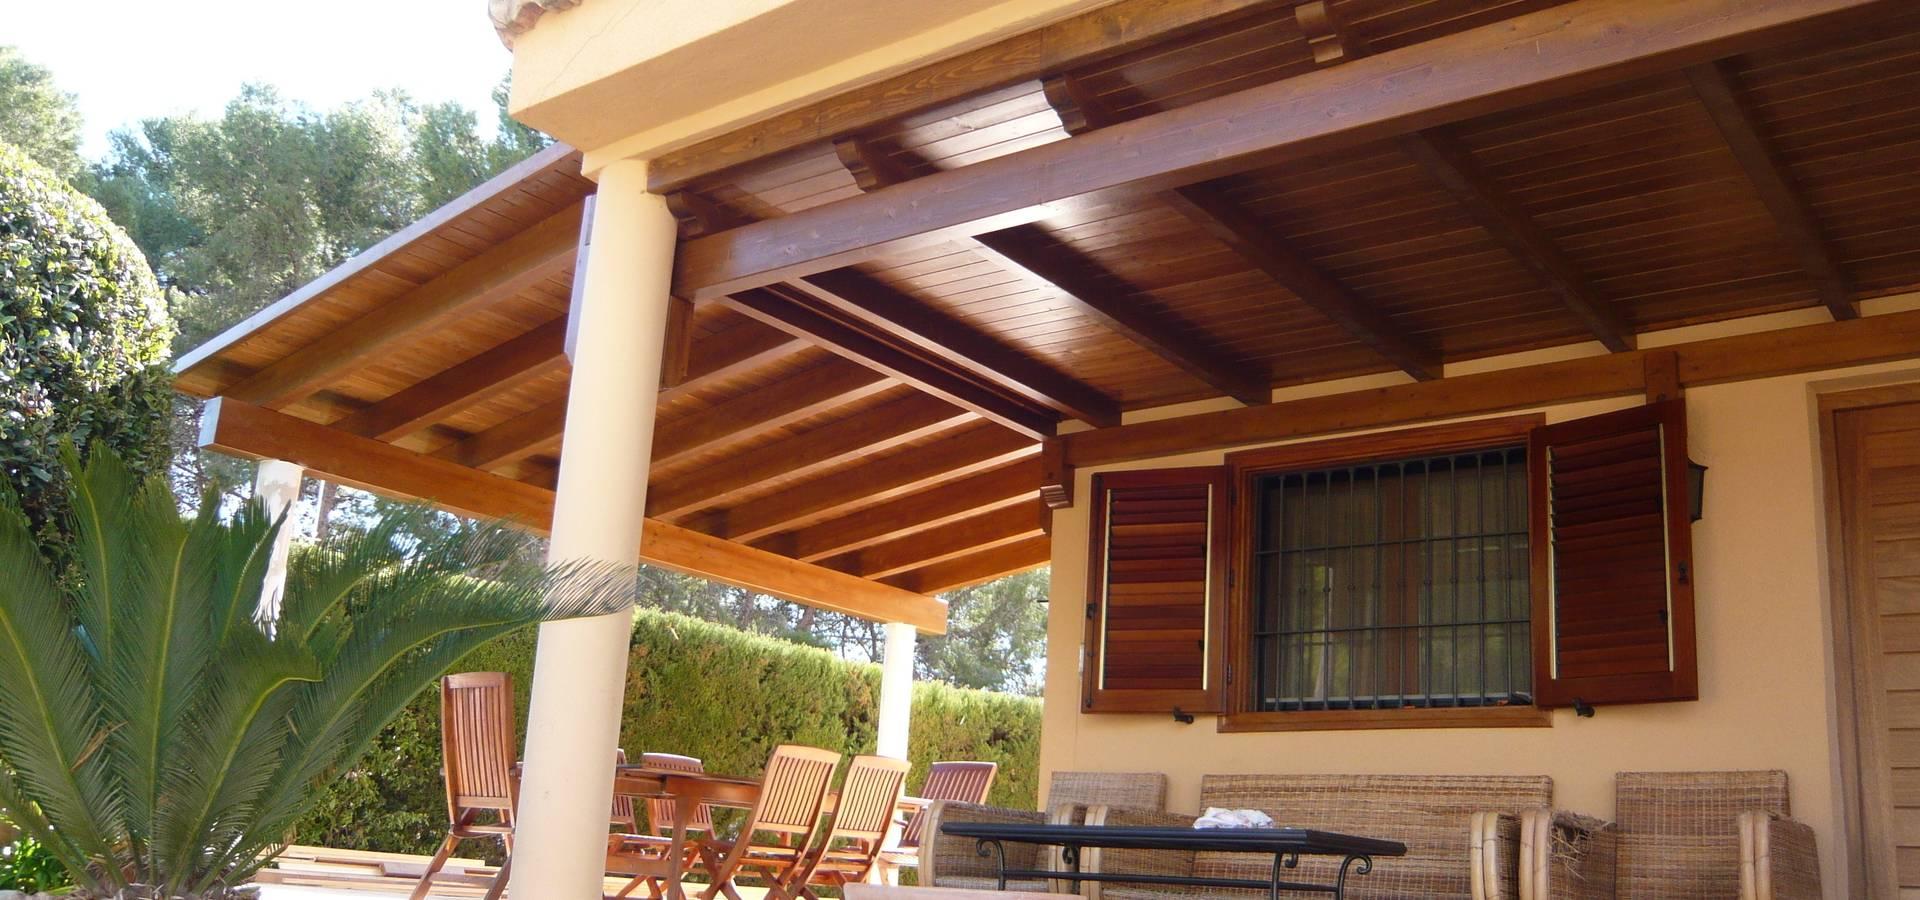 Porche de madera a un agua en color teka de tico y jard n for Porche jardin madera